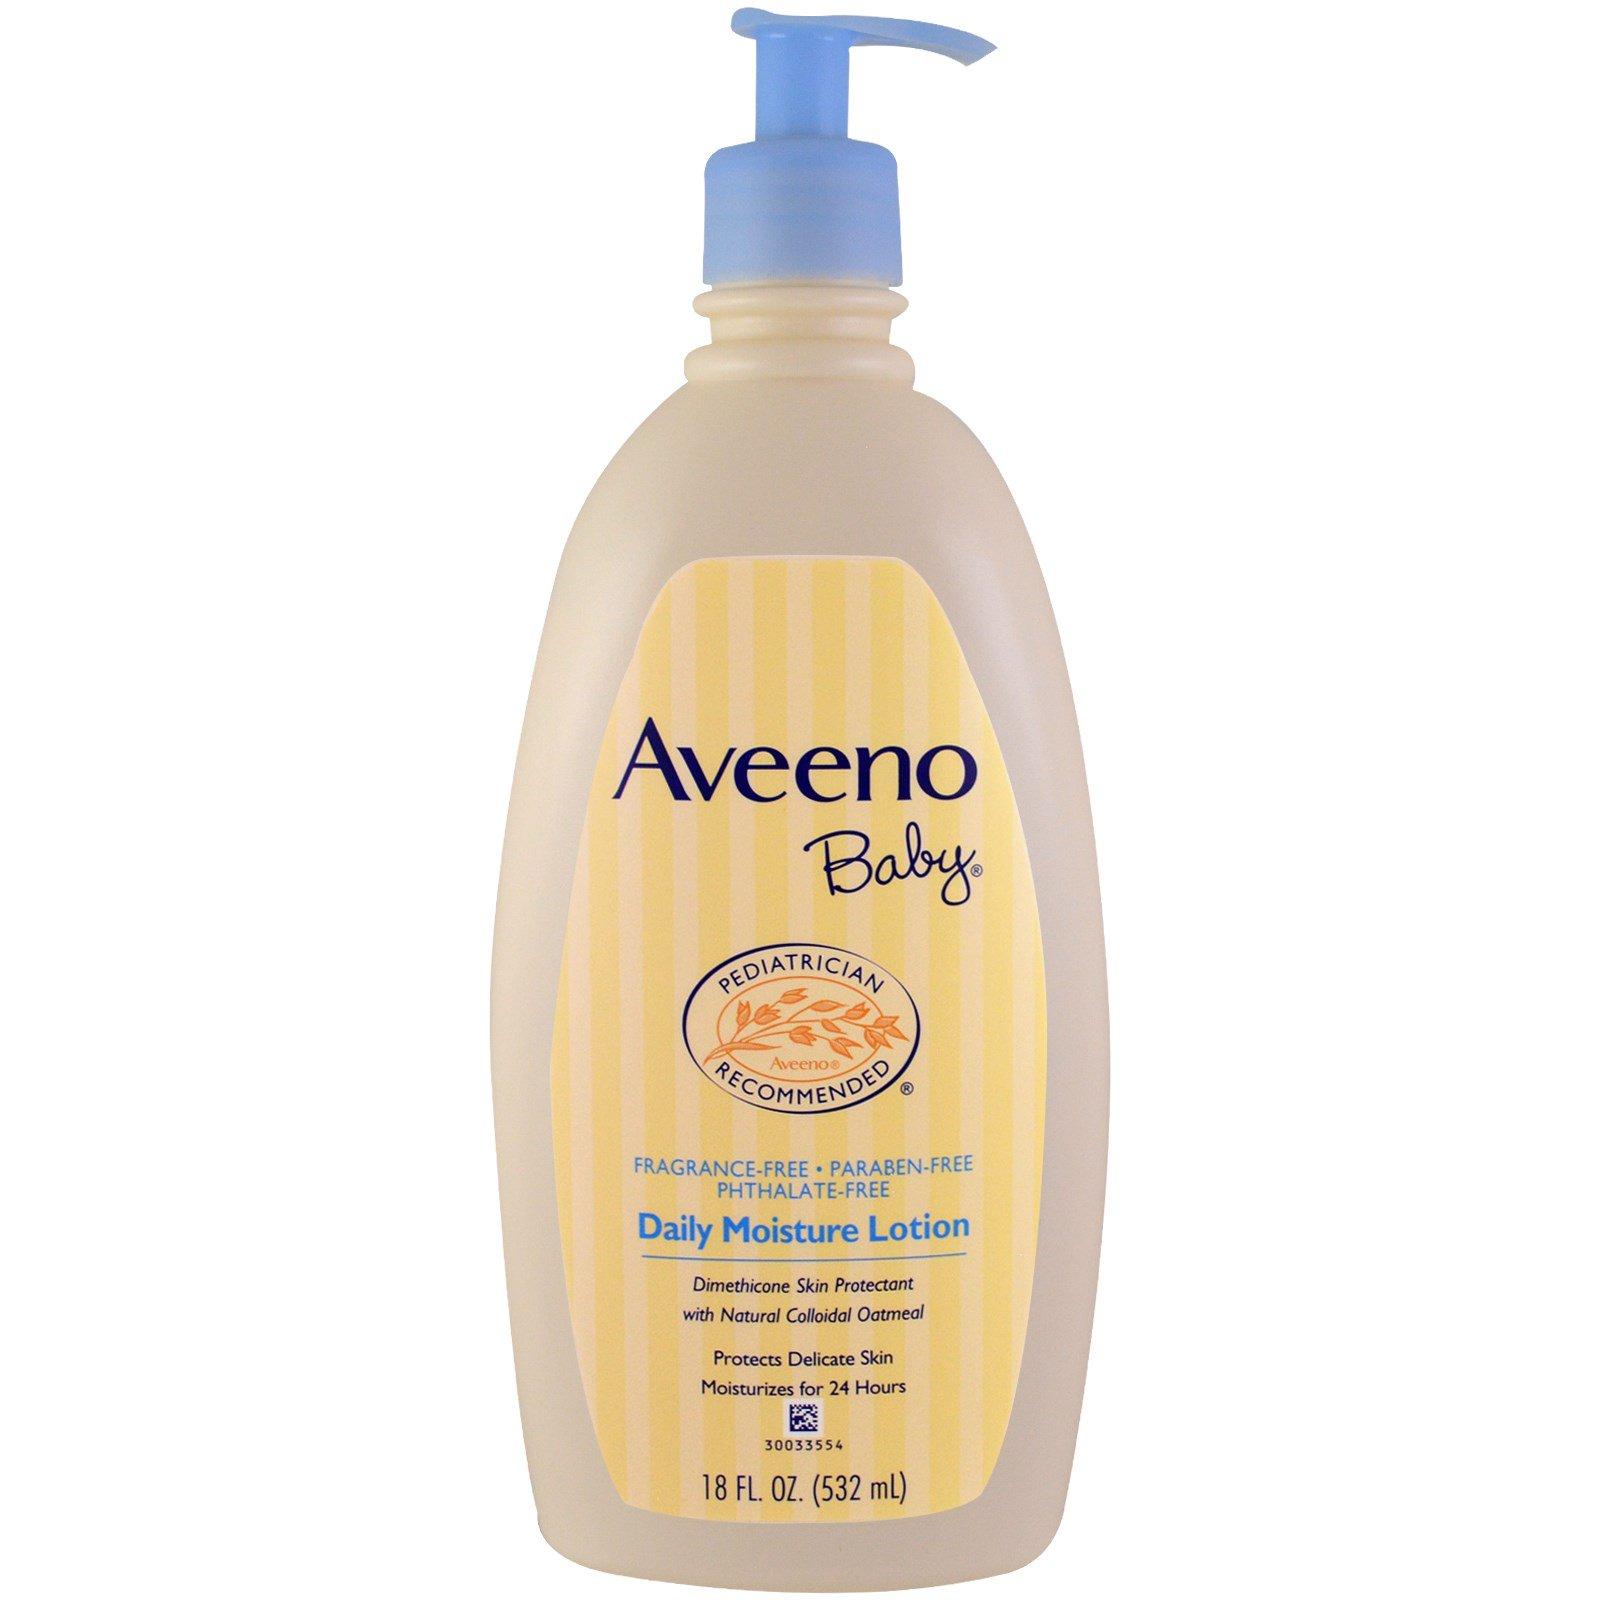 Aveeno Baby Daily Moisture Lotion Fragrance Free 18 Fl Oz